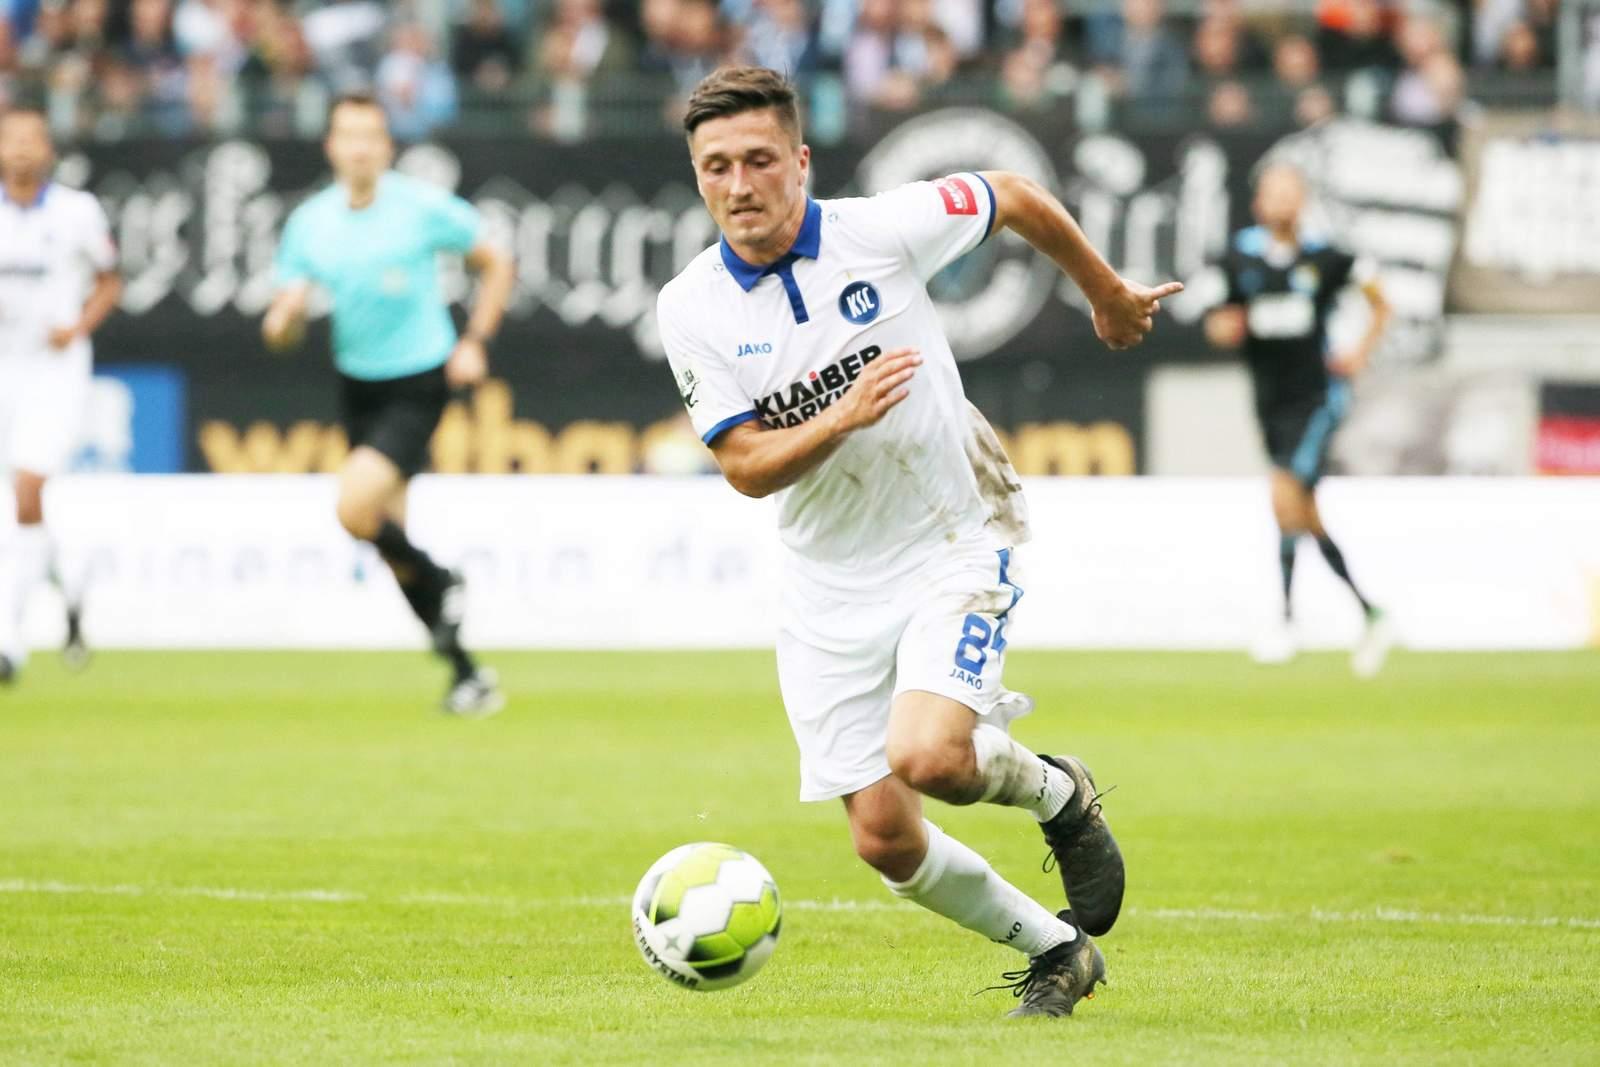 Angeschlagen: Karlsruhes Aktivposten Marcel Mehlem